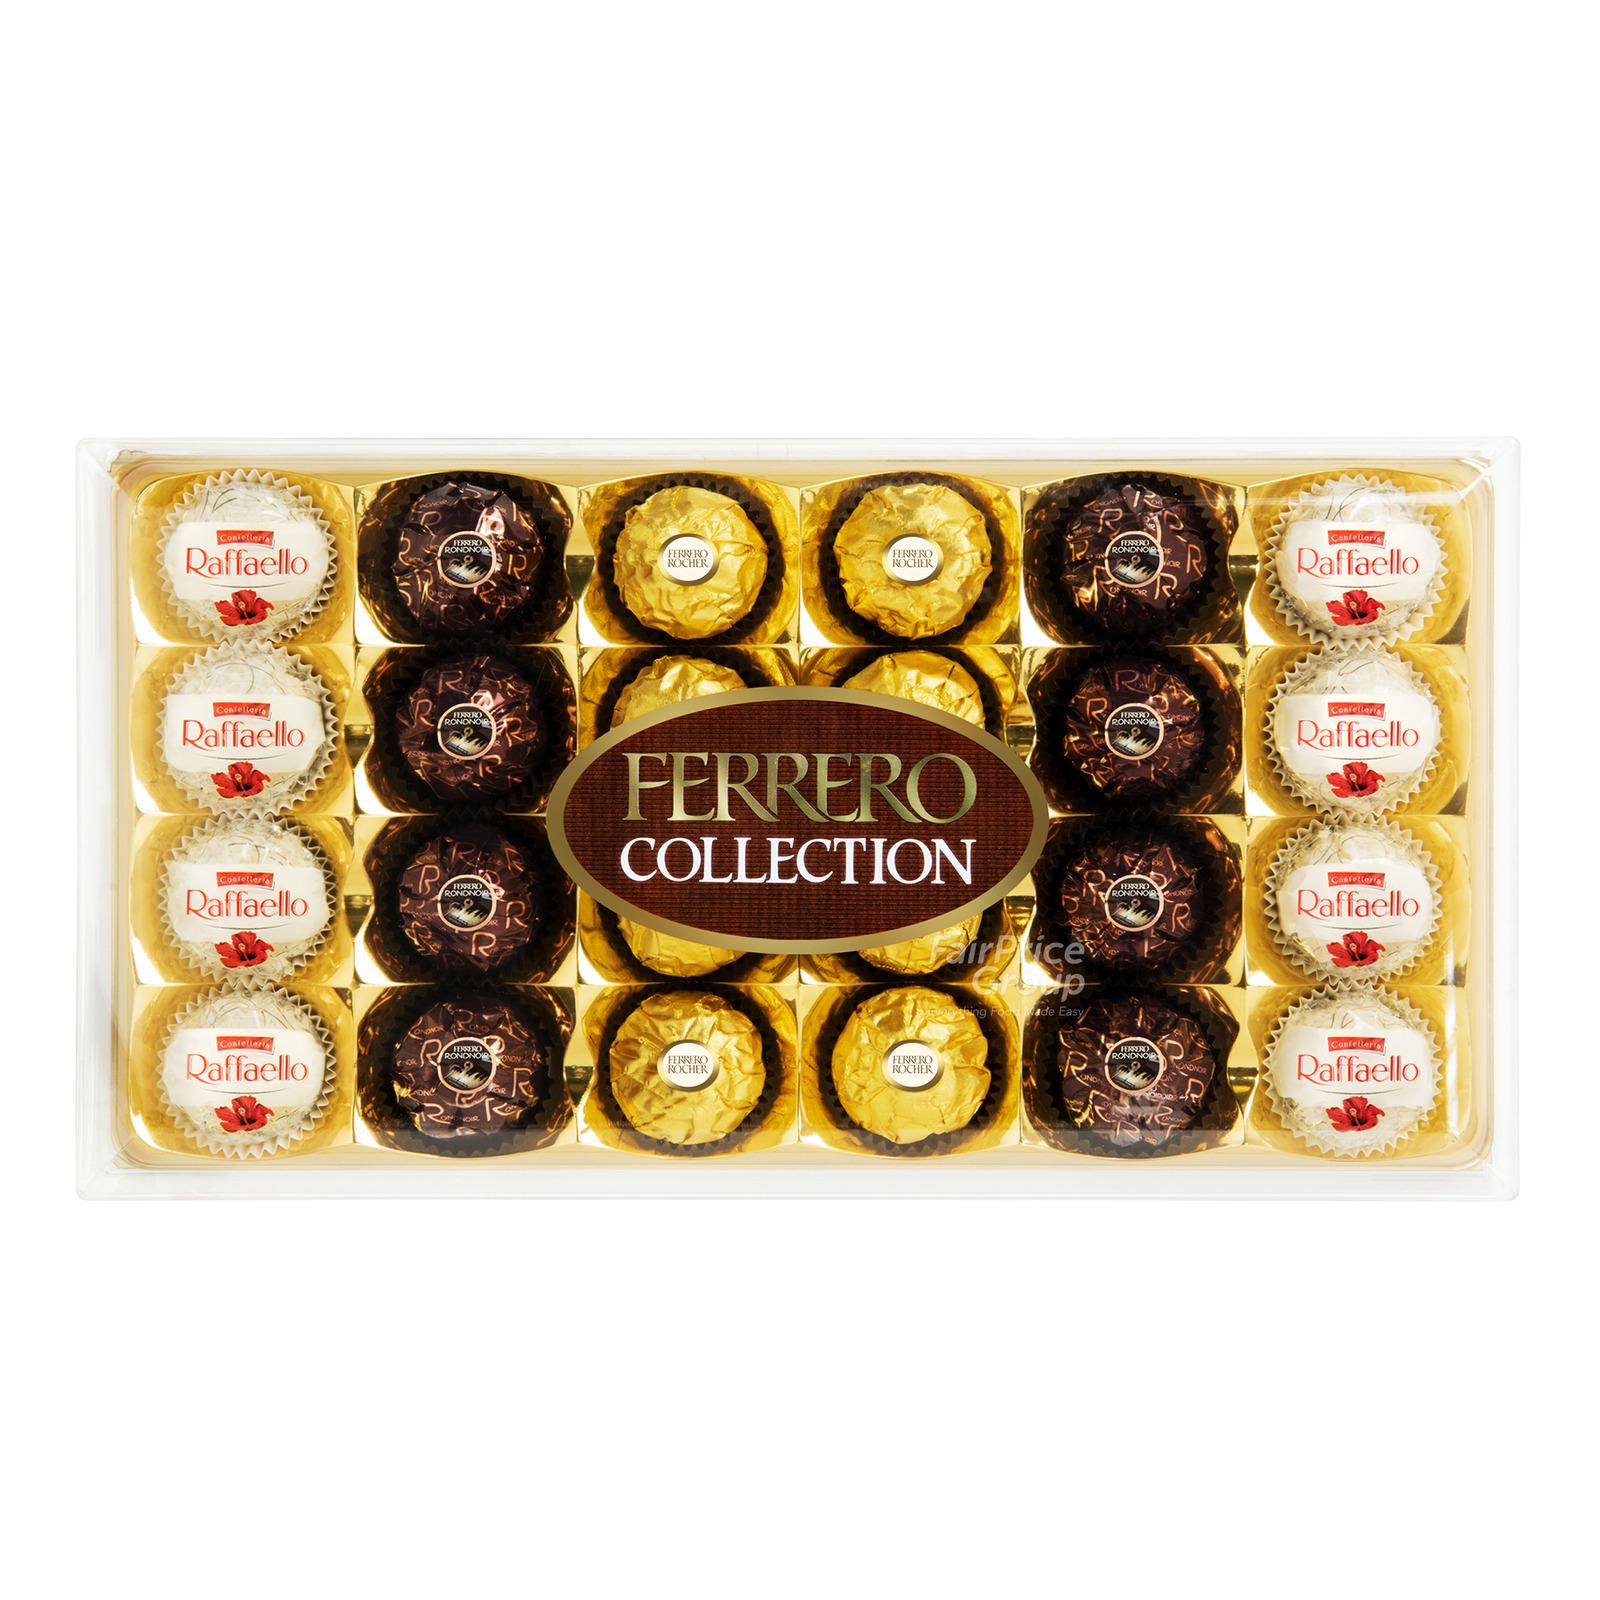 Ferrero Collection Chocolate - T24